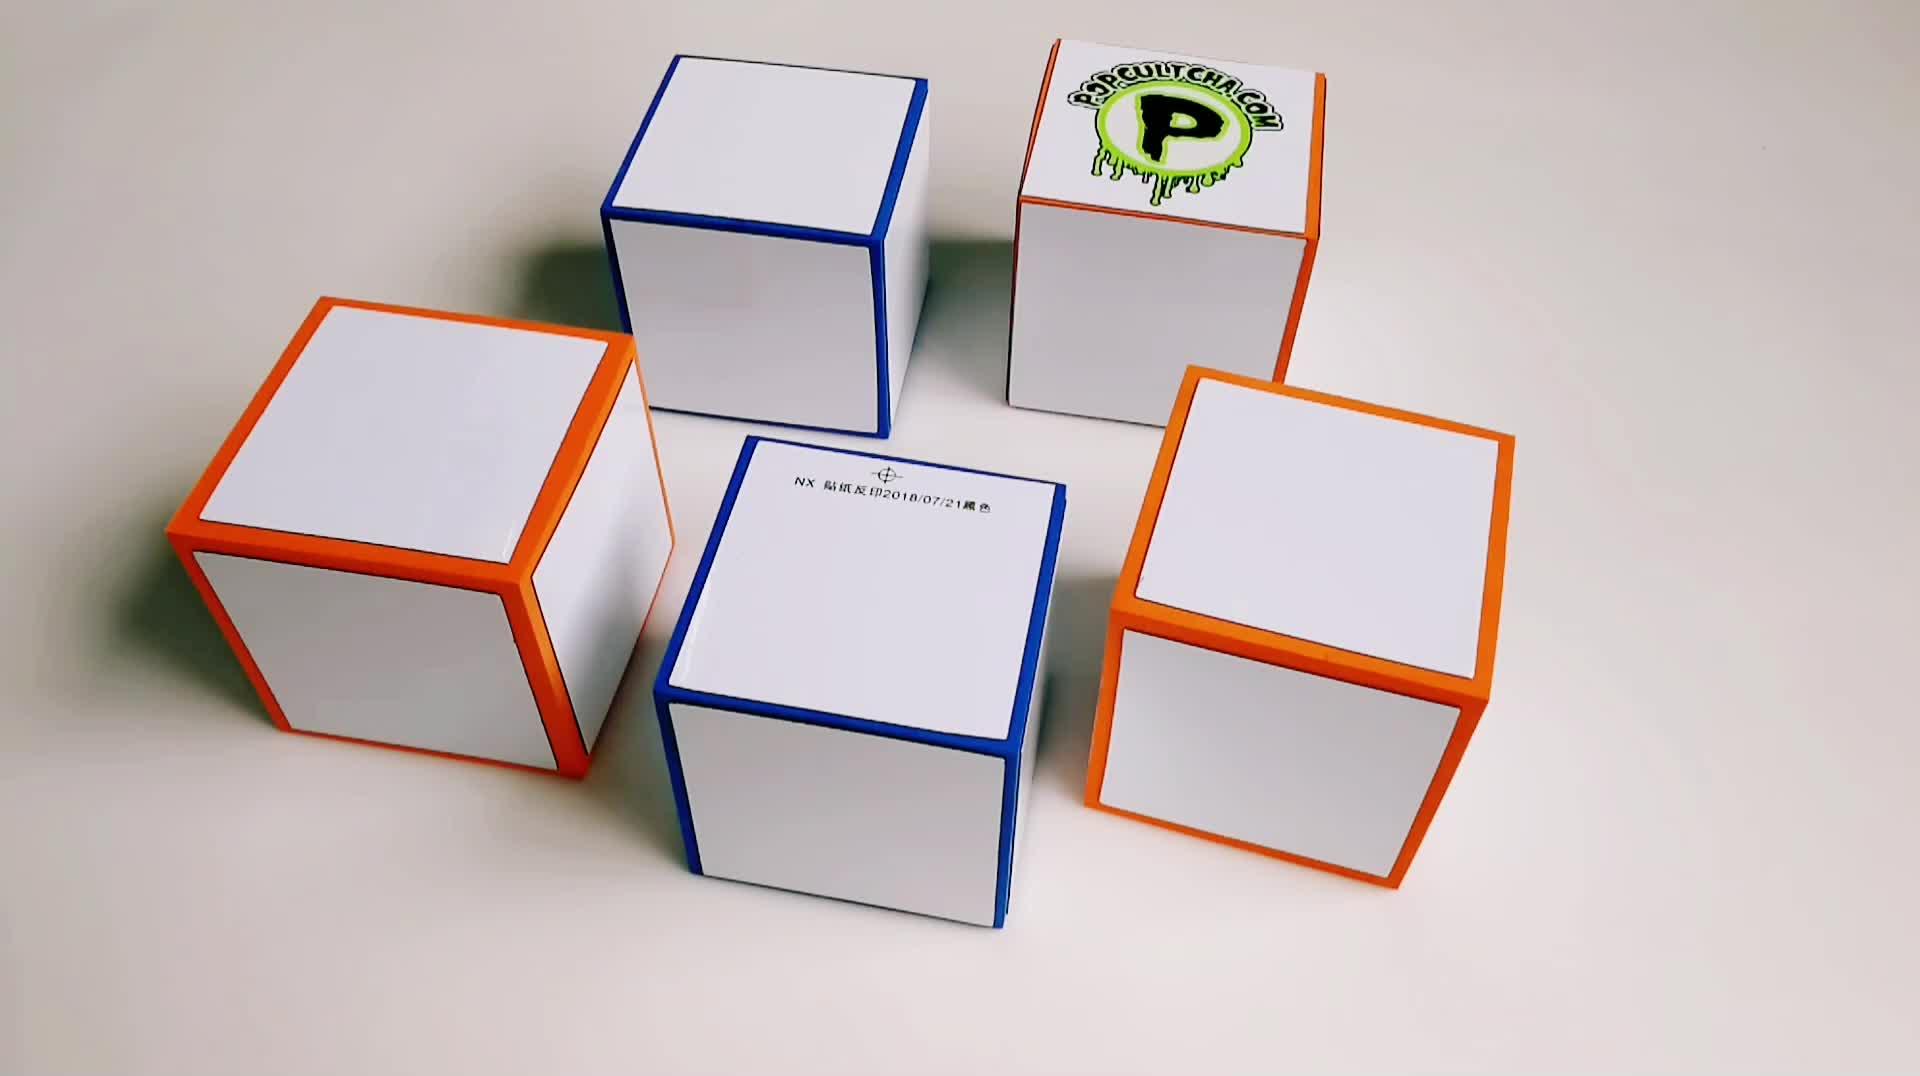 Custom foam Dry Erase Blocks set for kids educational toy